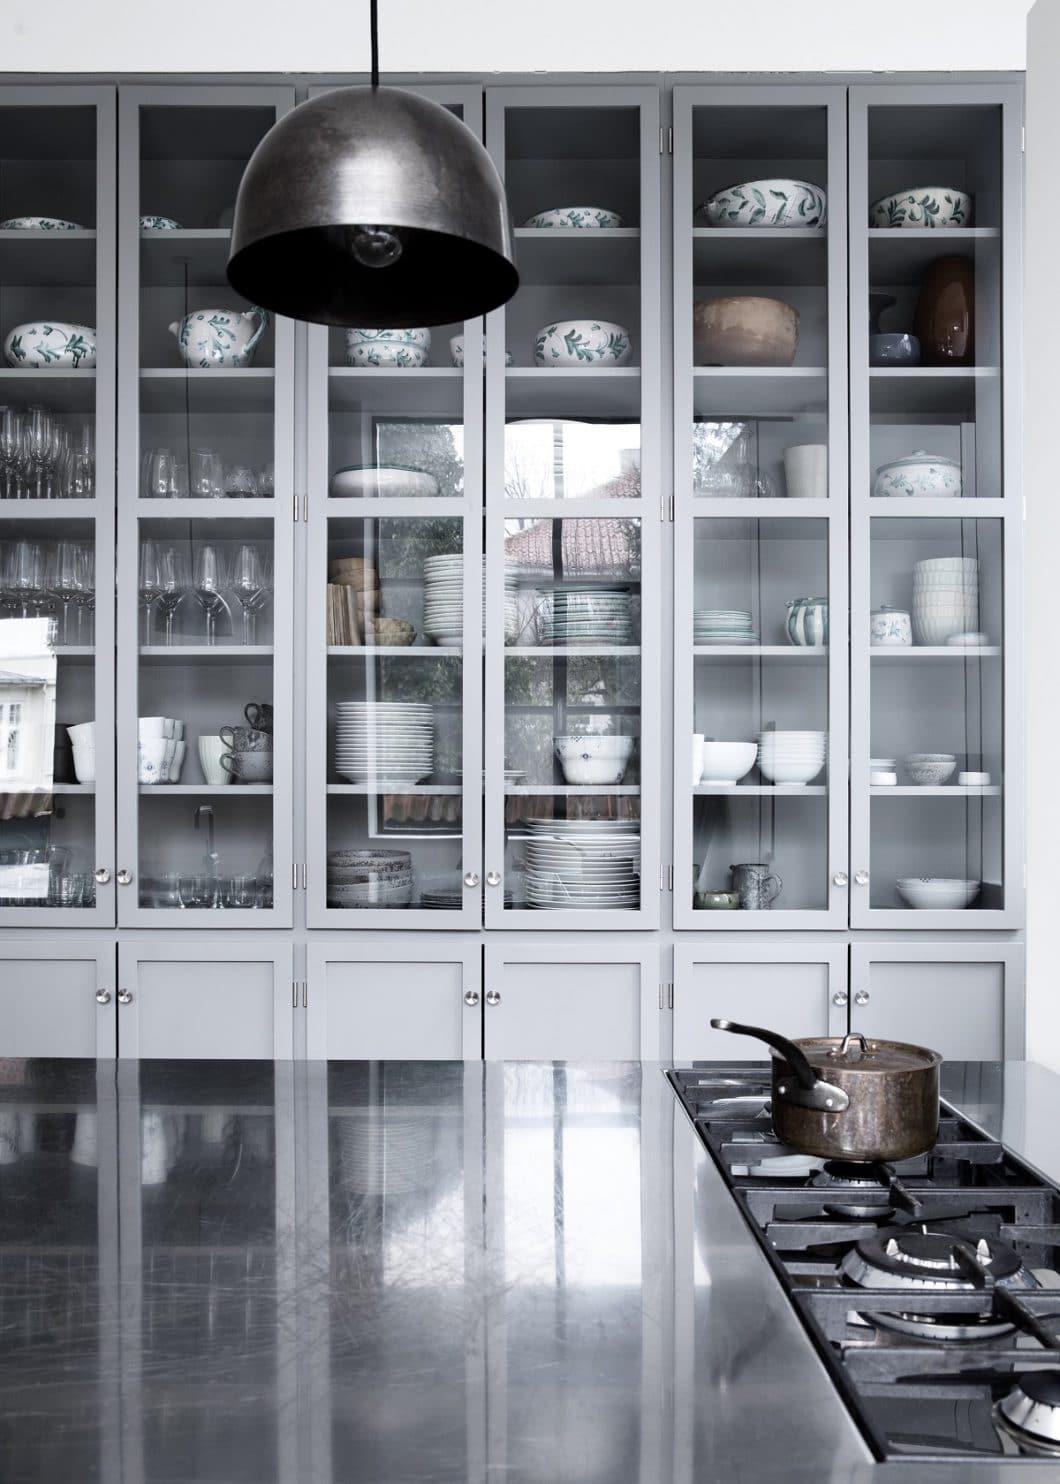 k benhavns m belsnedkeri d nische k chen zum verlieben. Black Bedroom Furniture Sets. Home Design Ideas